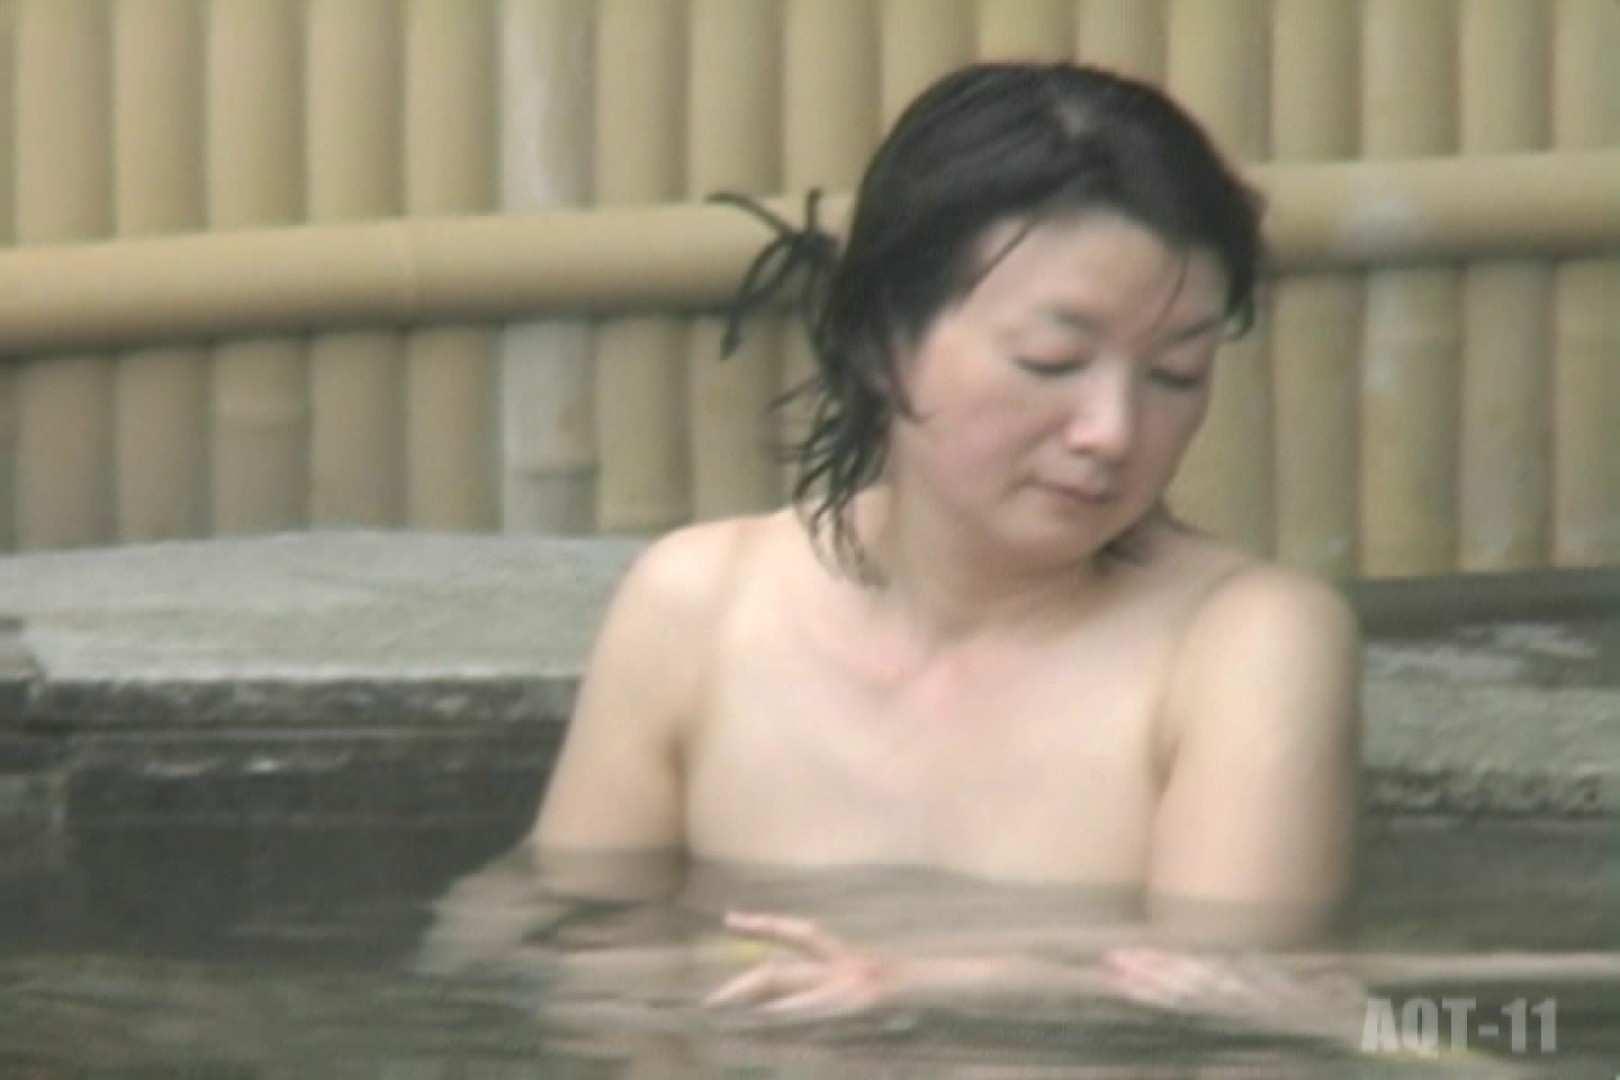 Aquaな露天風呂Vol.801 露天風呂編  92PIX 24